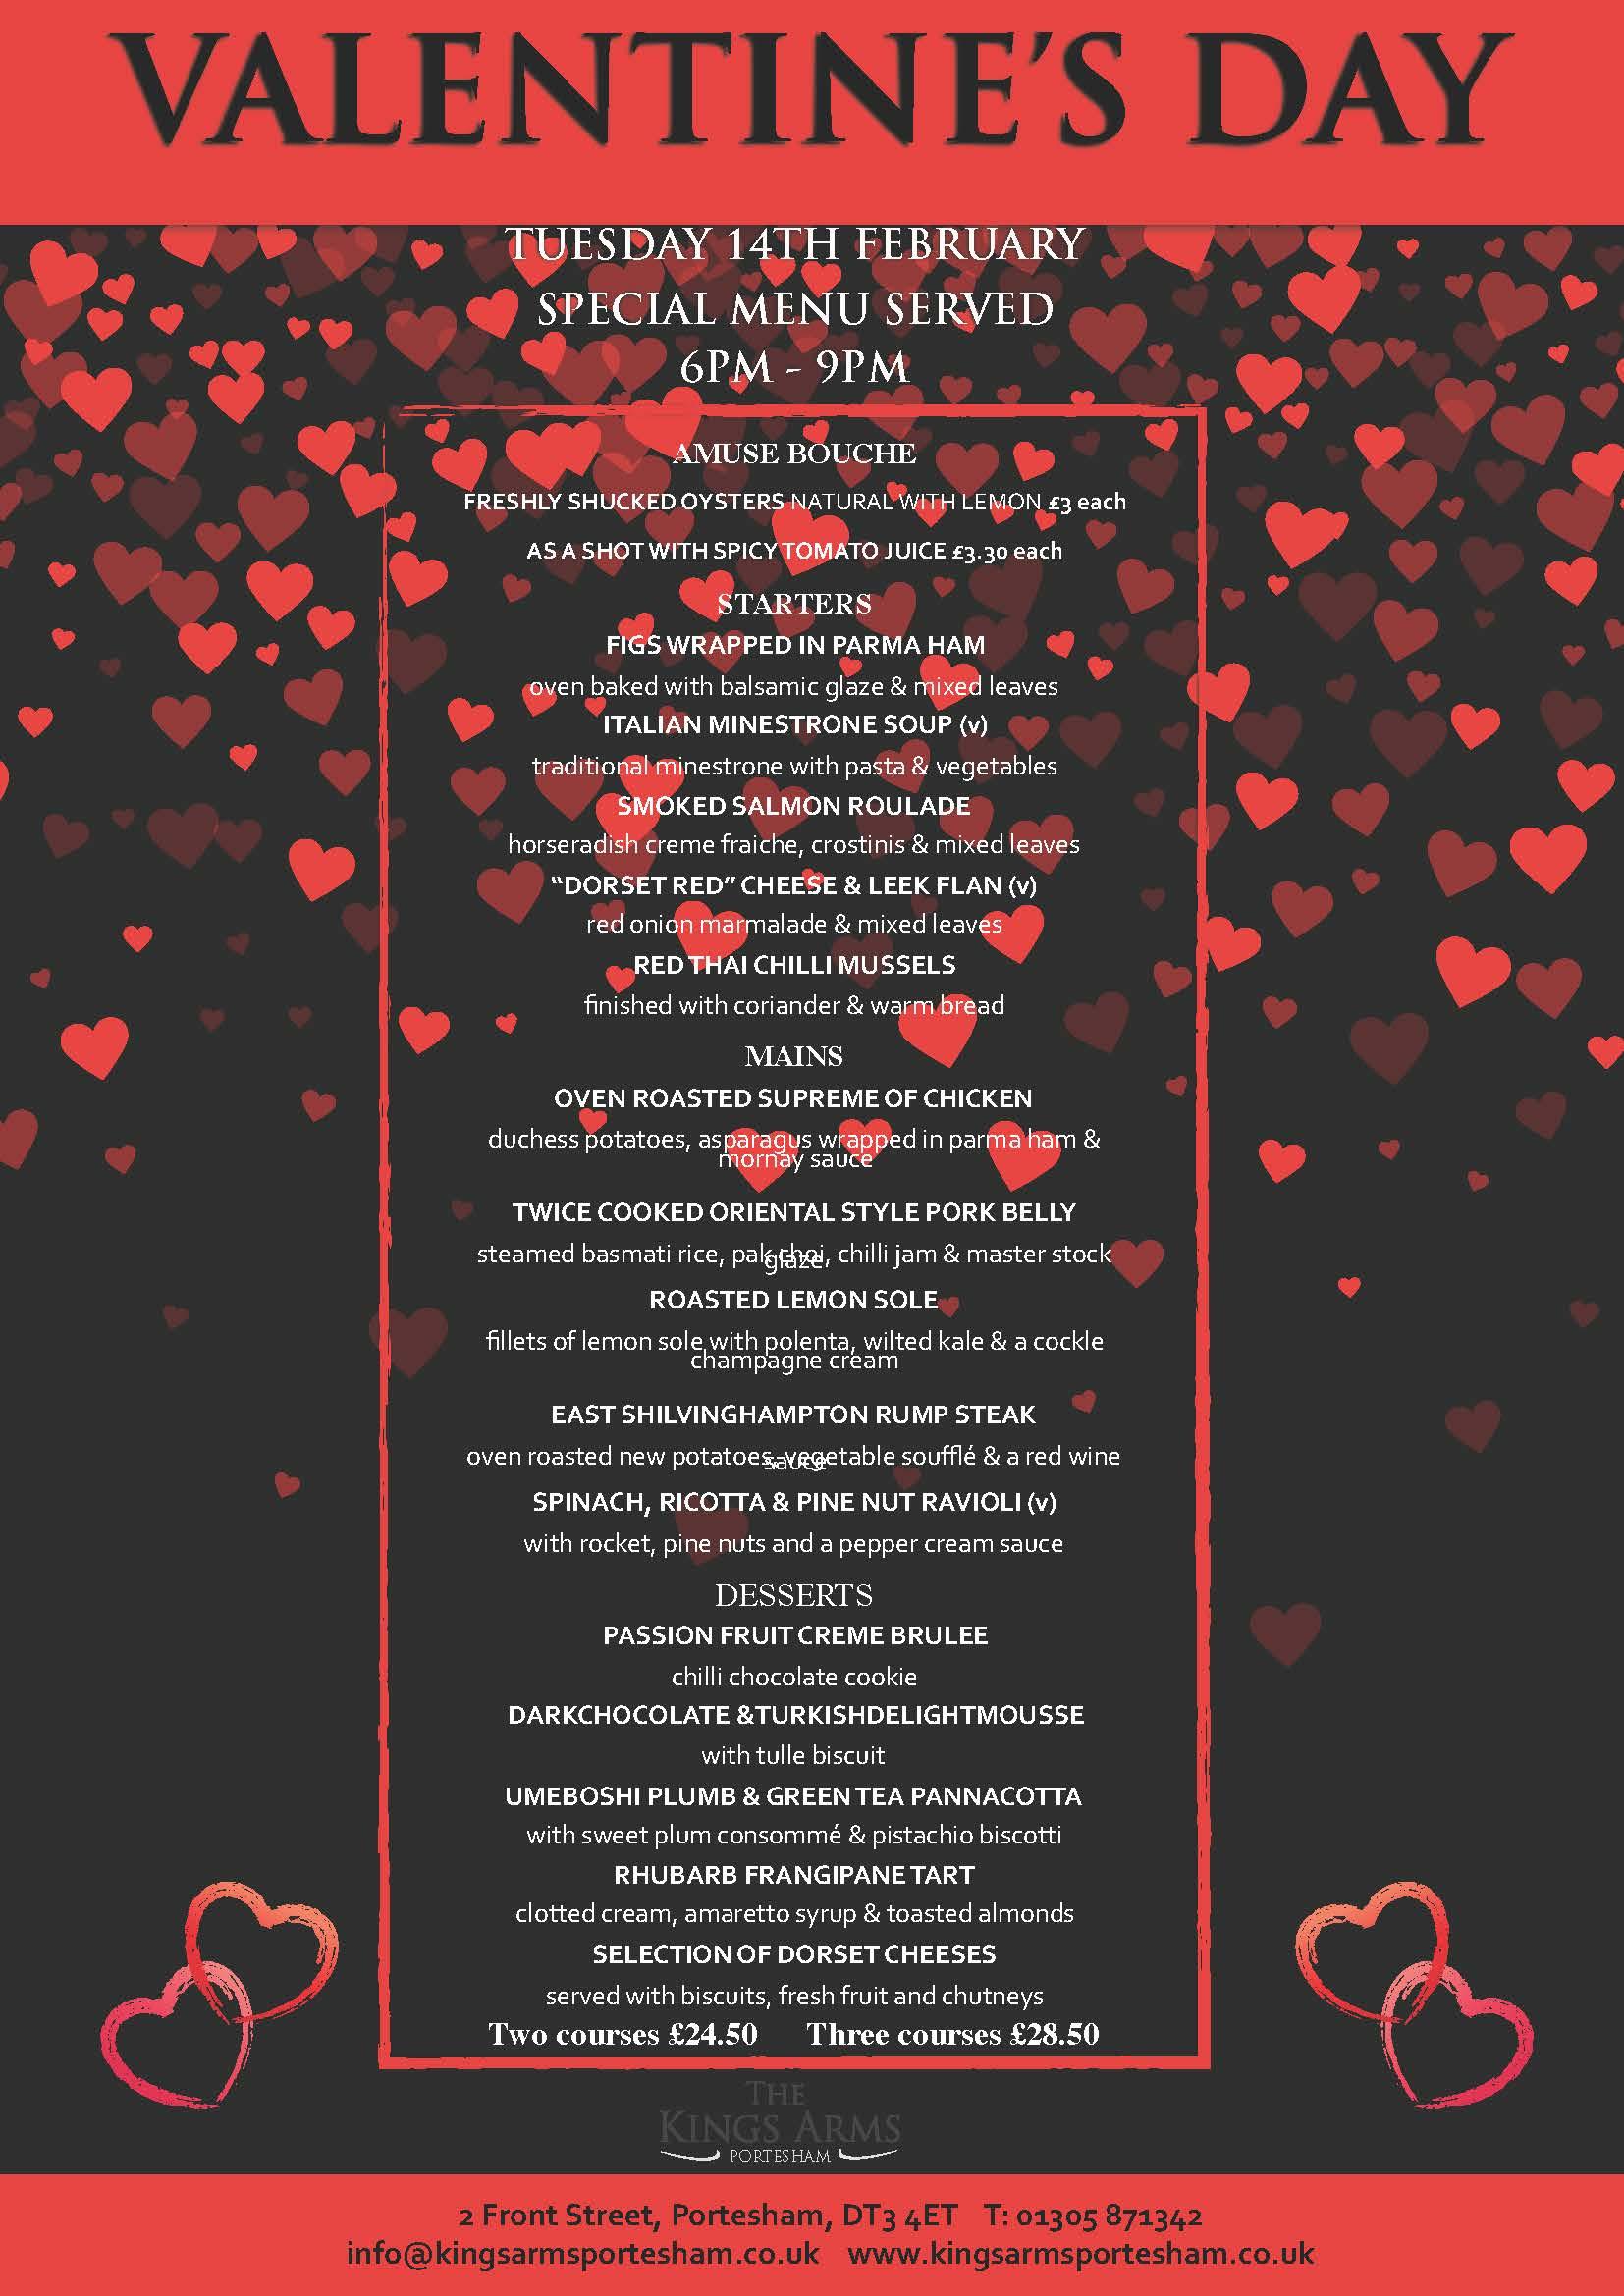 Valentines Poster 2017 (002)